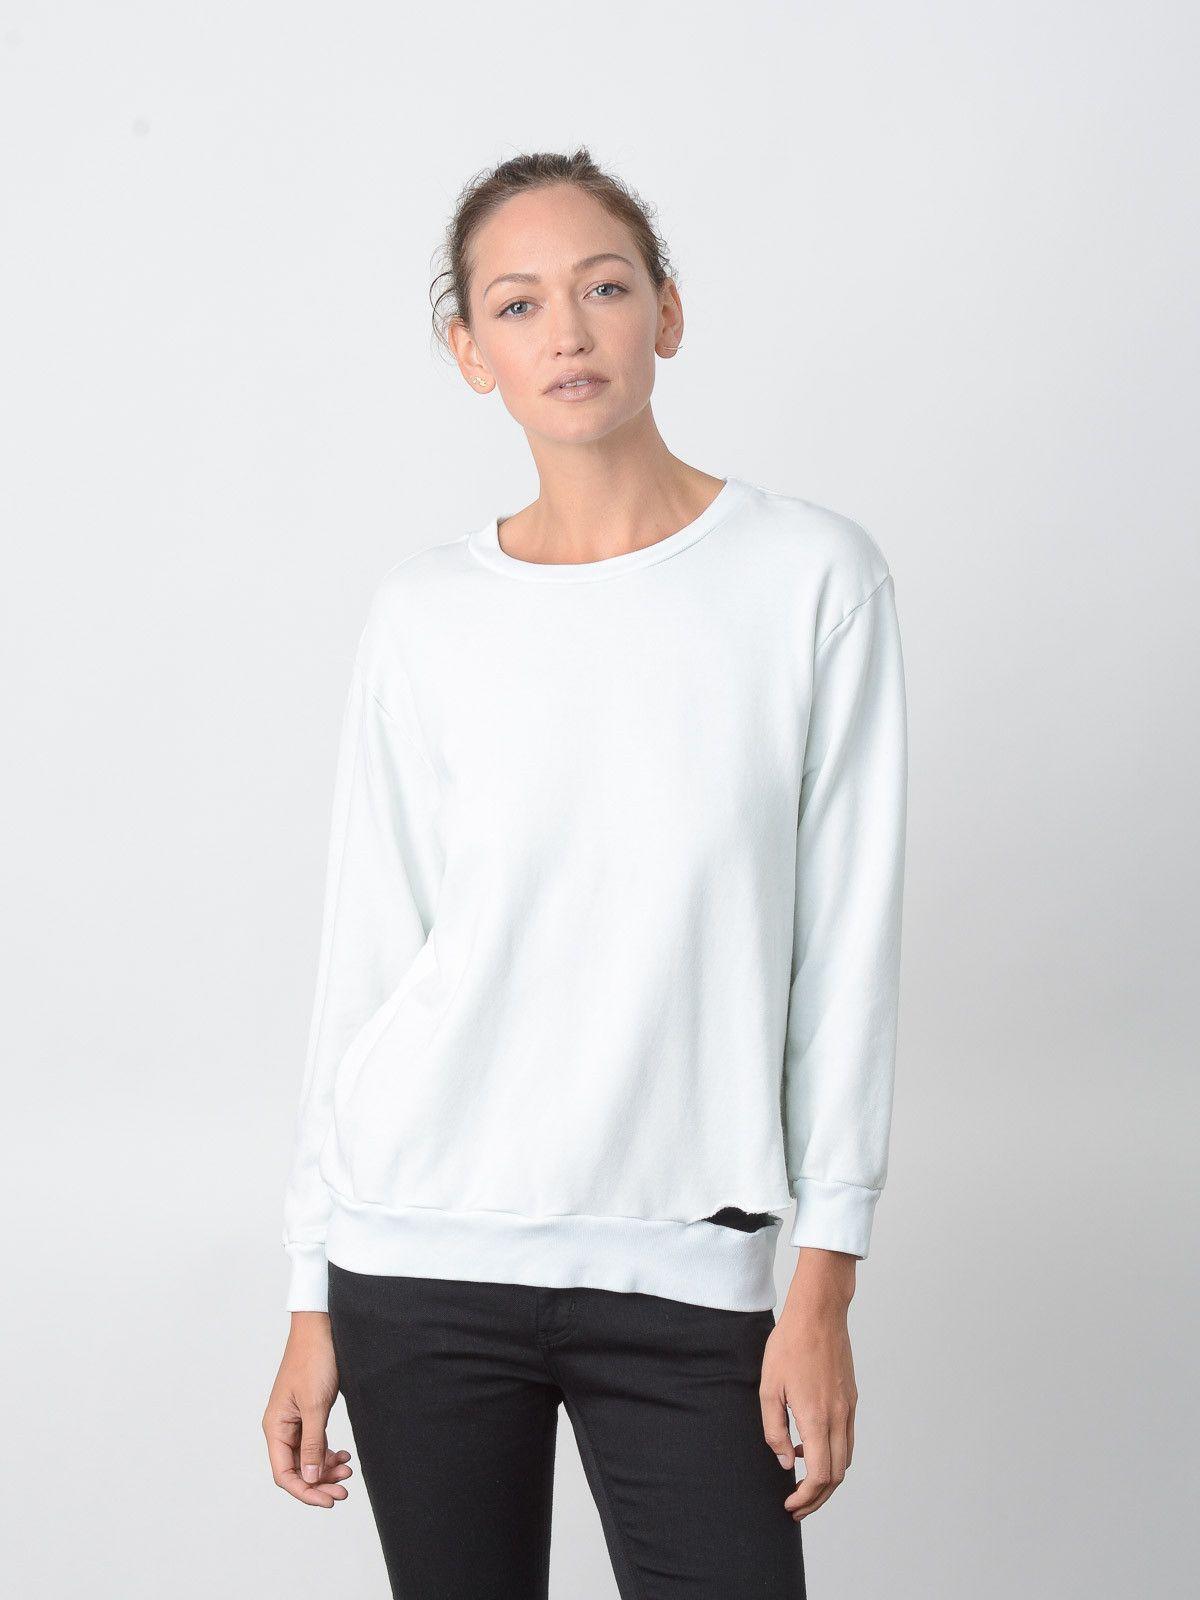 Farrago Sweatshirt / Honeydew